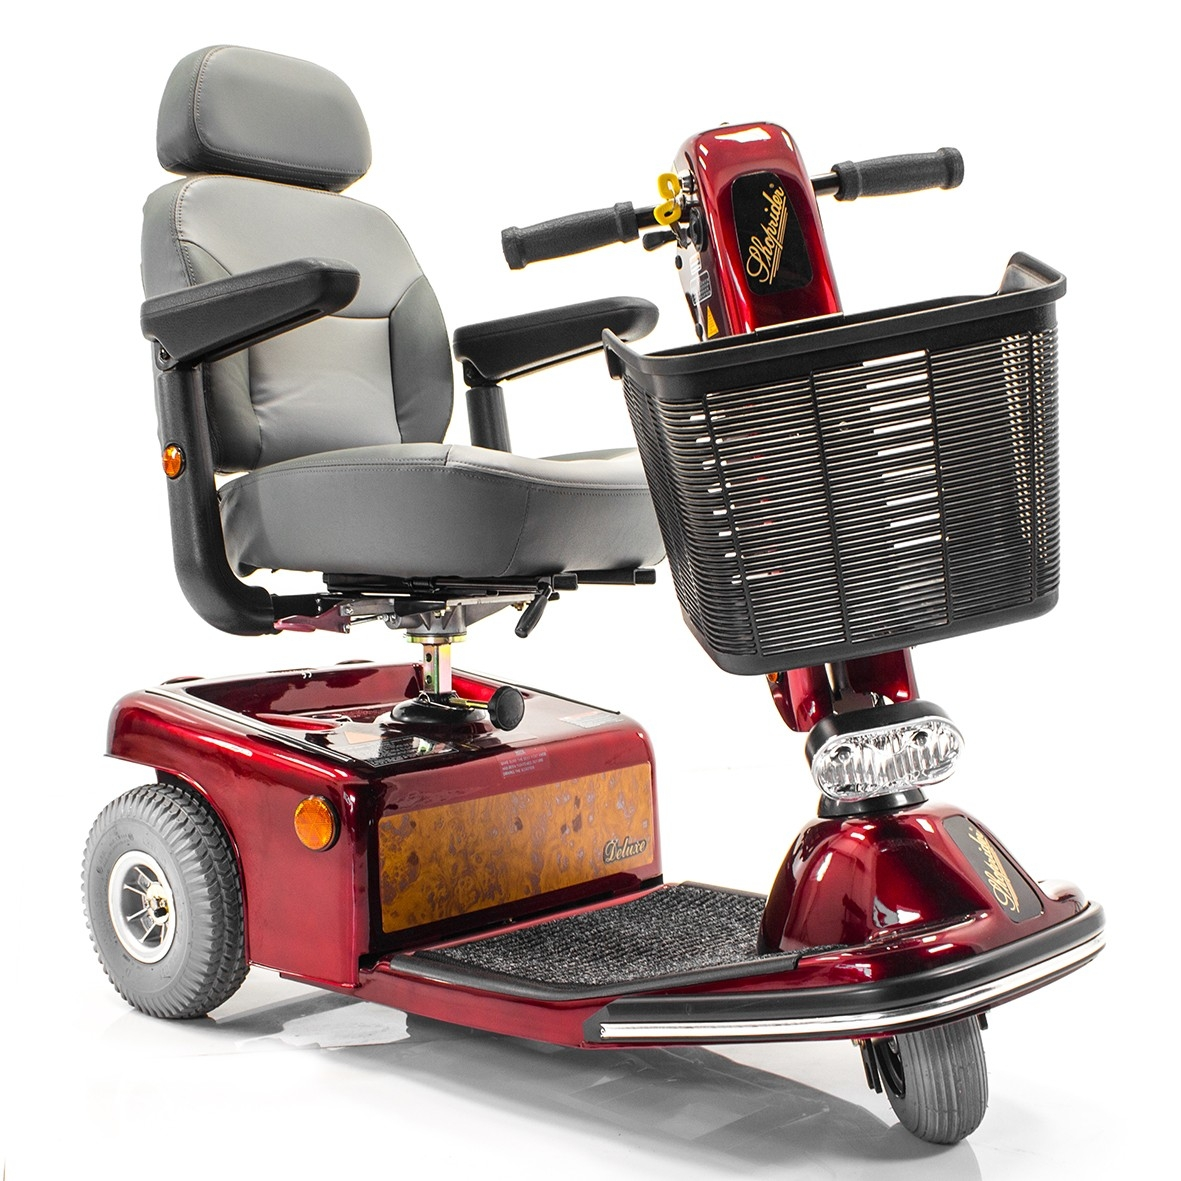 Shoprider Sunrunner 3 - Model 888B-3 - Electric Scooter